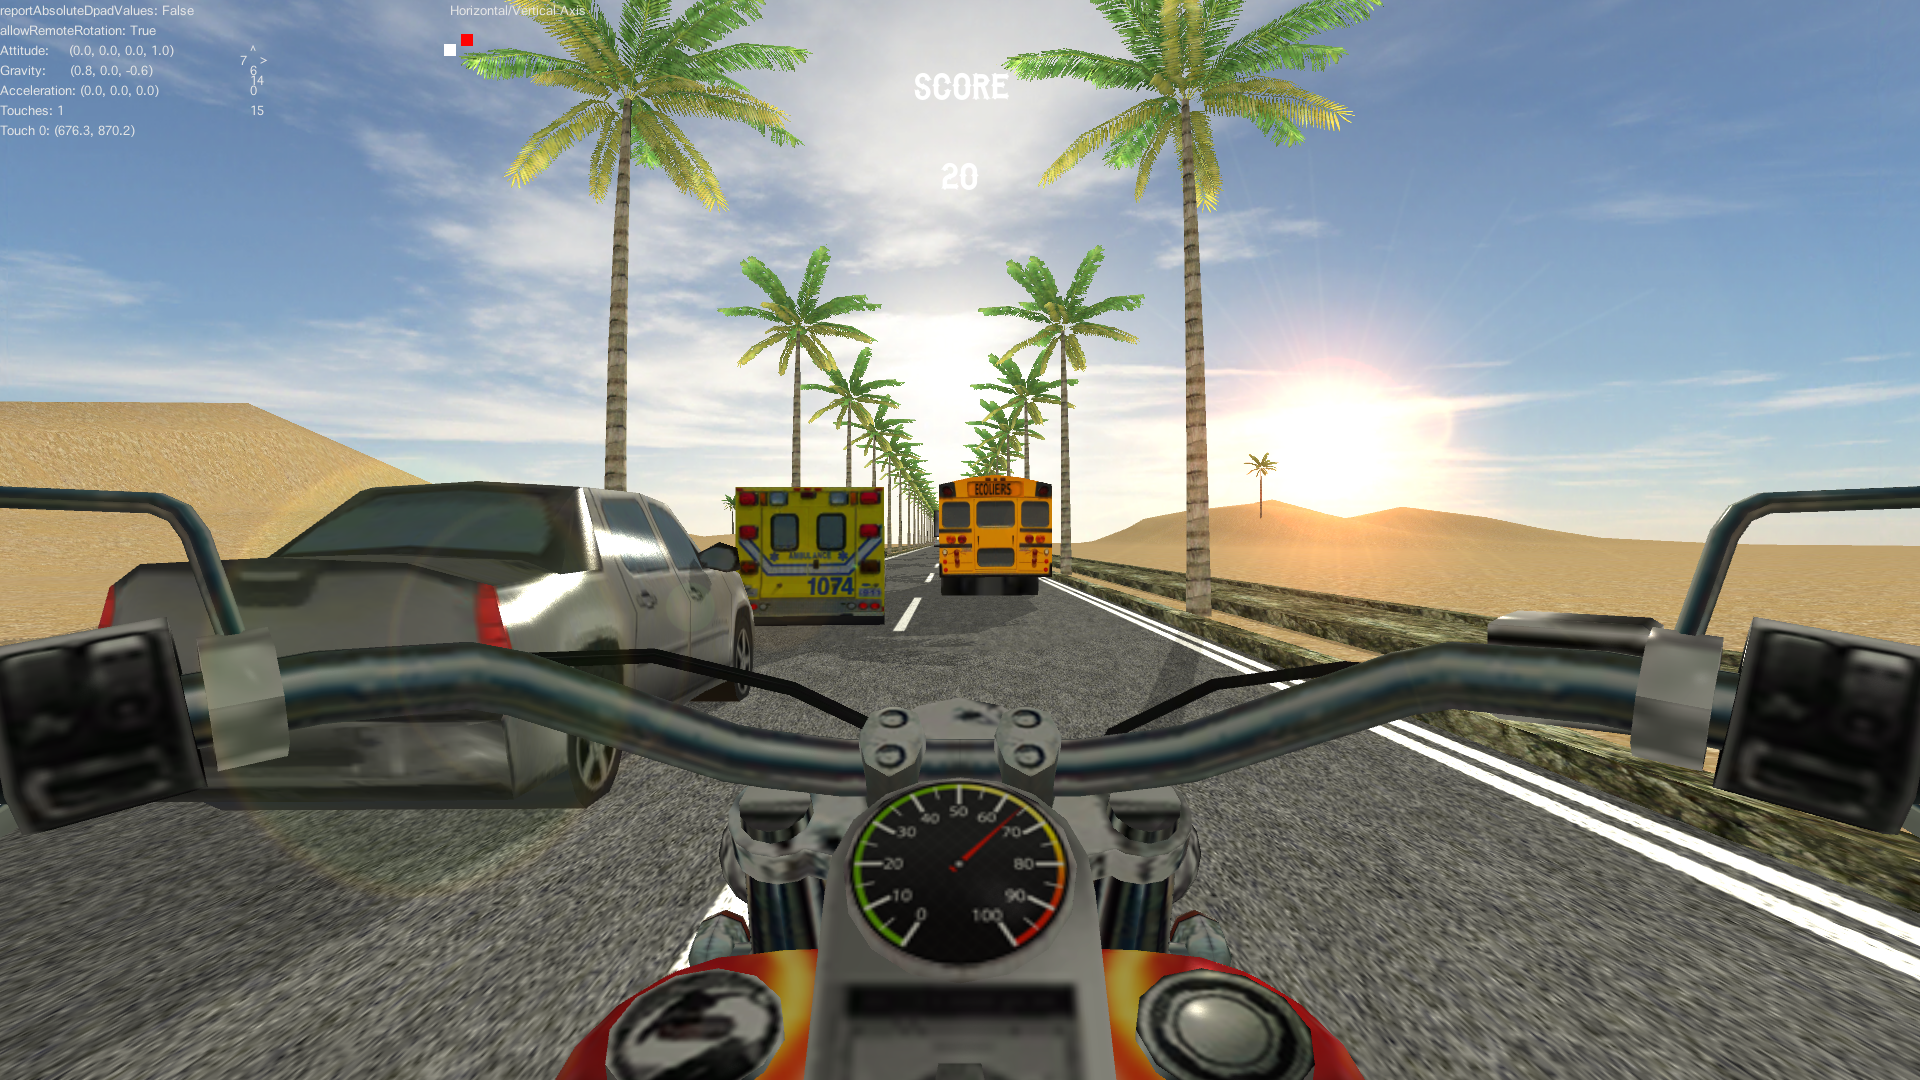 Biker Run screenshot 2